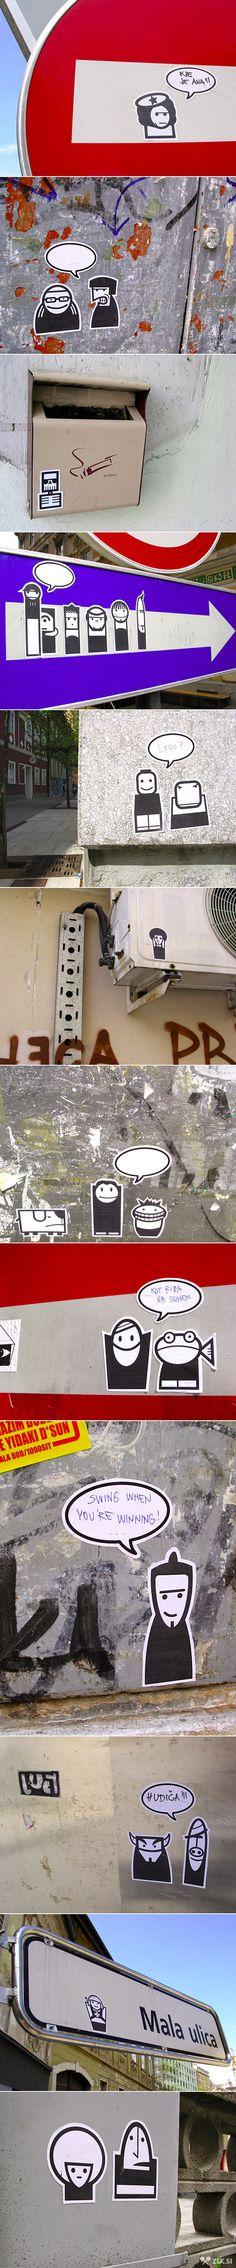 Street Art #design #StreetArt #urban #UrbanArt #paint #graffiti #inspiration #ArtInspiration #DesignInspiration #SprayPaint